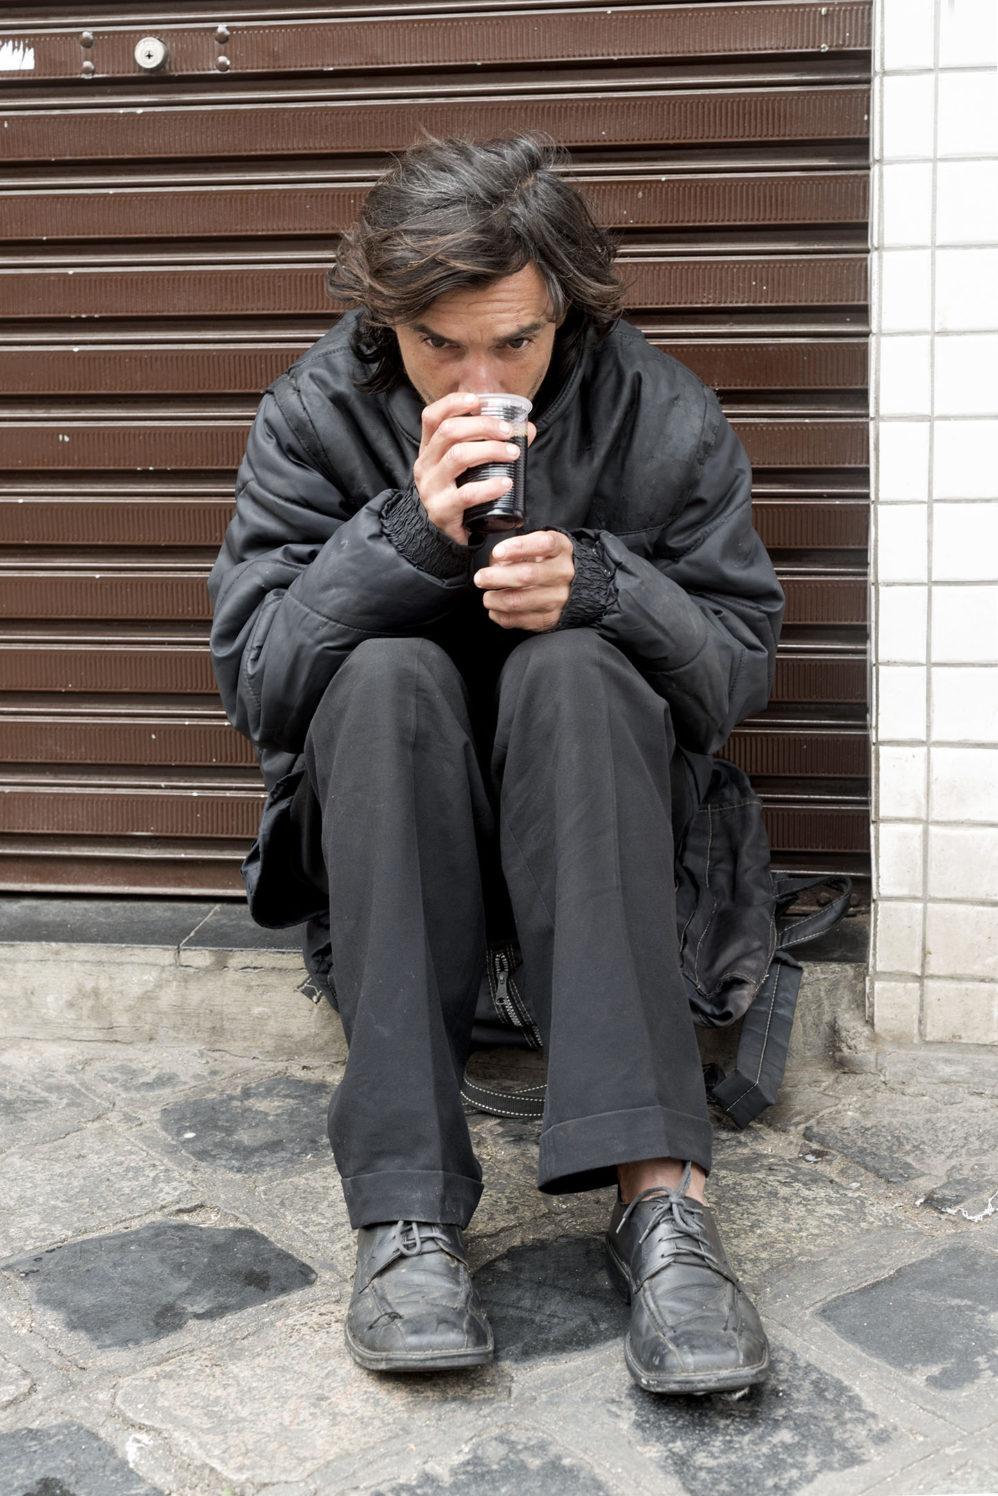 Homeless Curitiba by Martijn Crowe